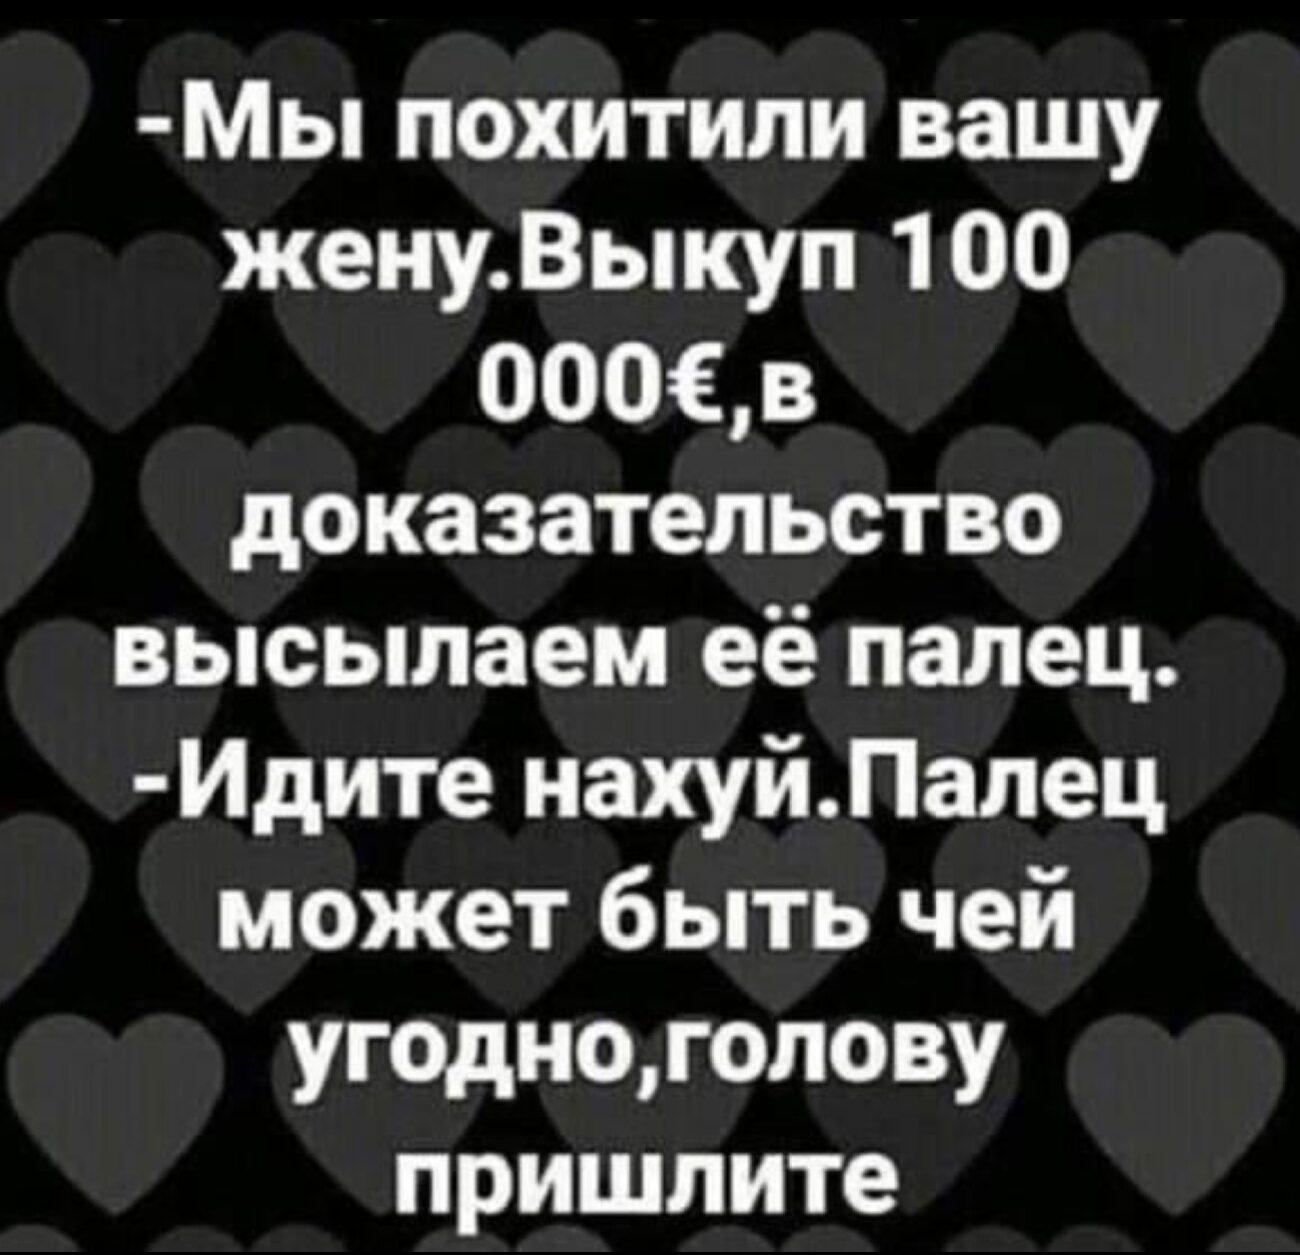 https://i.mycdn.me/i?r=AyH4iRPQ2q0otWIFepML2LxRRiCqrxuXwURhhPY6BY0Xjw